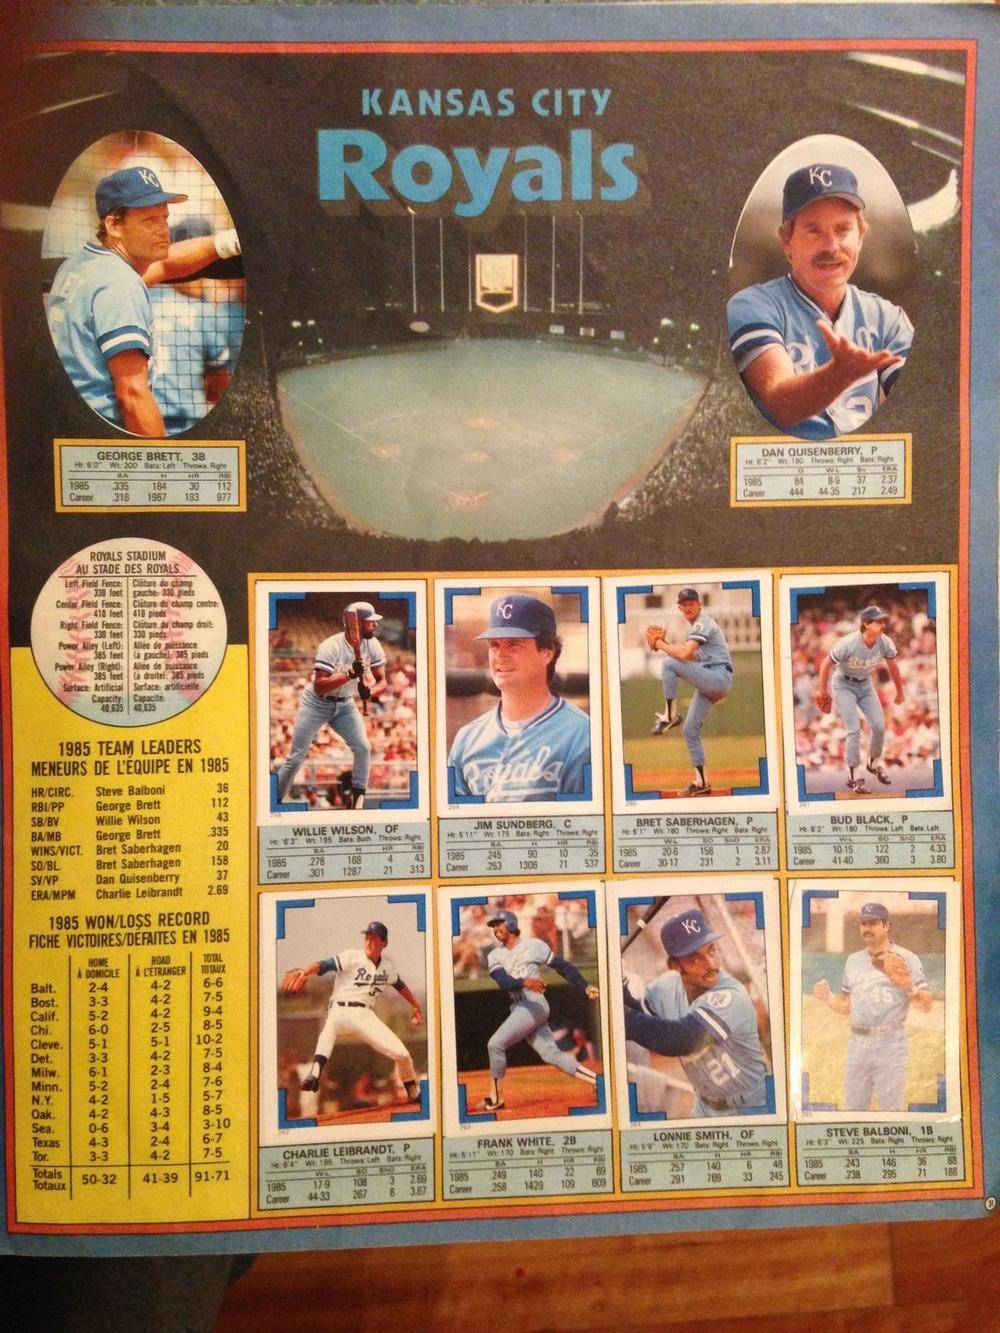 The 1985 Kansas City Royals (highlight: Dan Quisenberry not playing baseball)